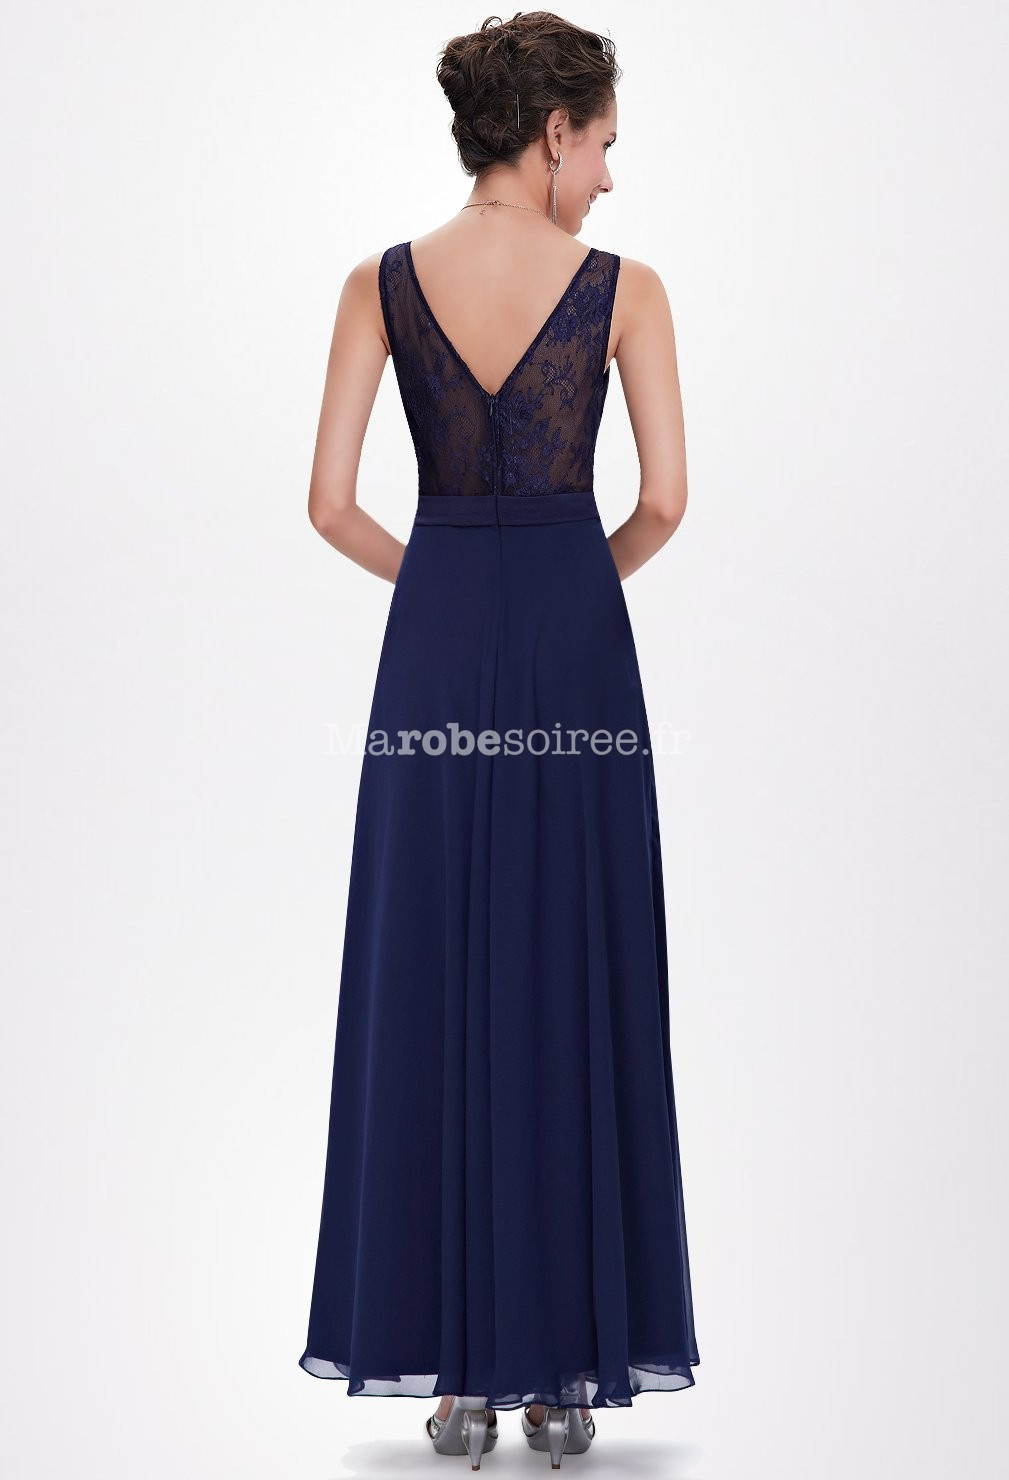 robe longue avec dentelle dans le dos et d collet v. Black Bedroom Furniture Sets. Home Design Ideas